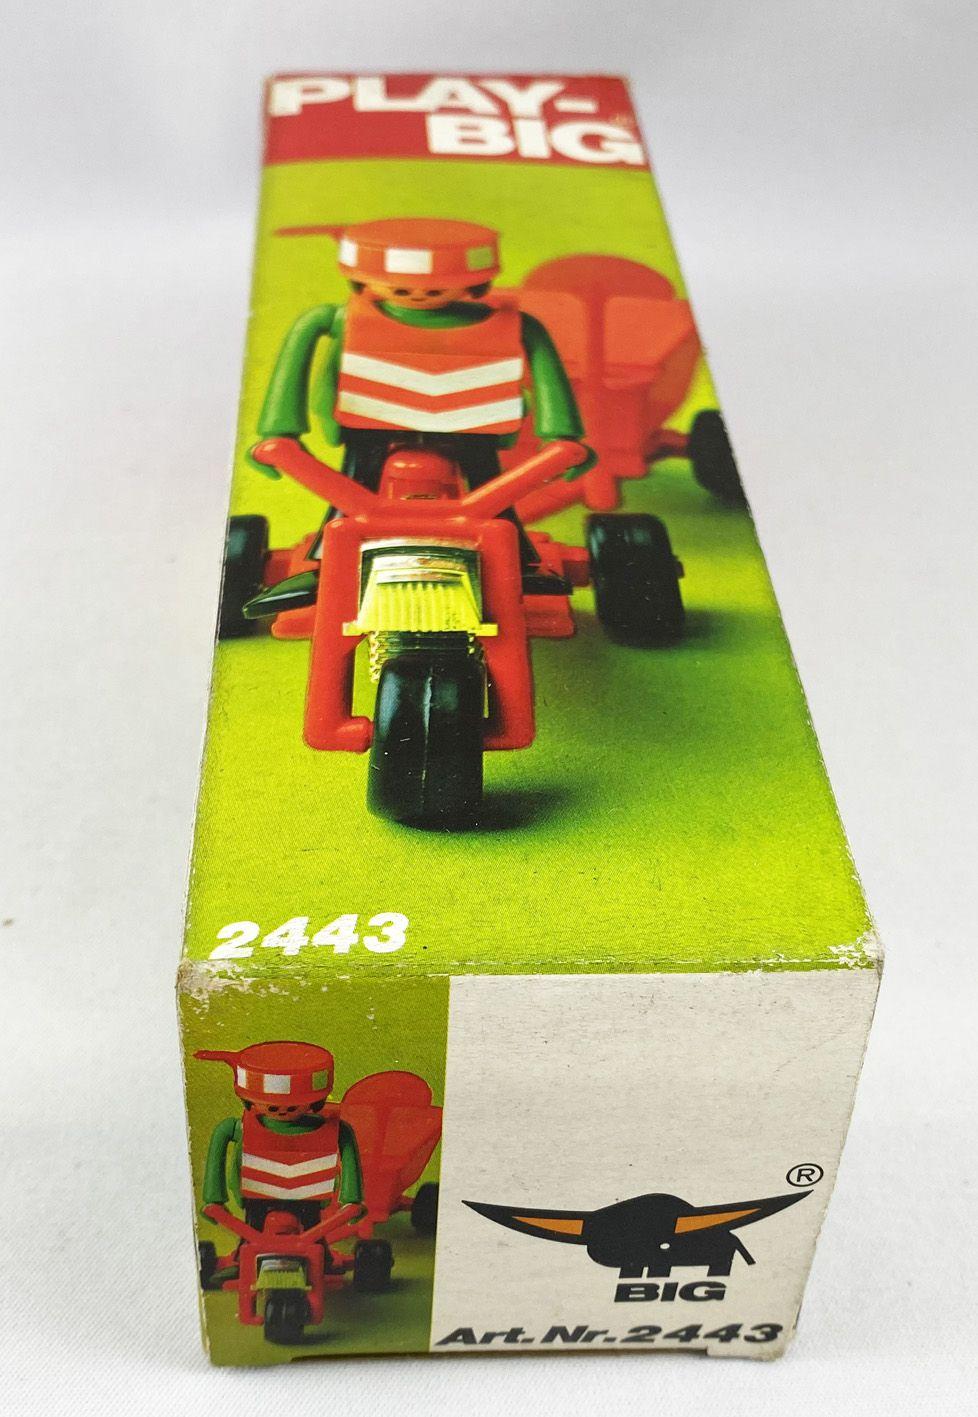 Play-Big - Ref.2443 Public Works Motorcycle